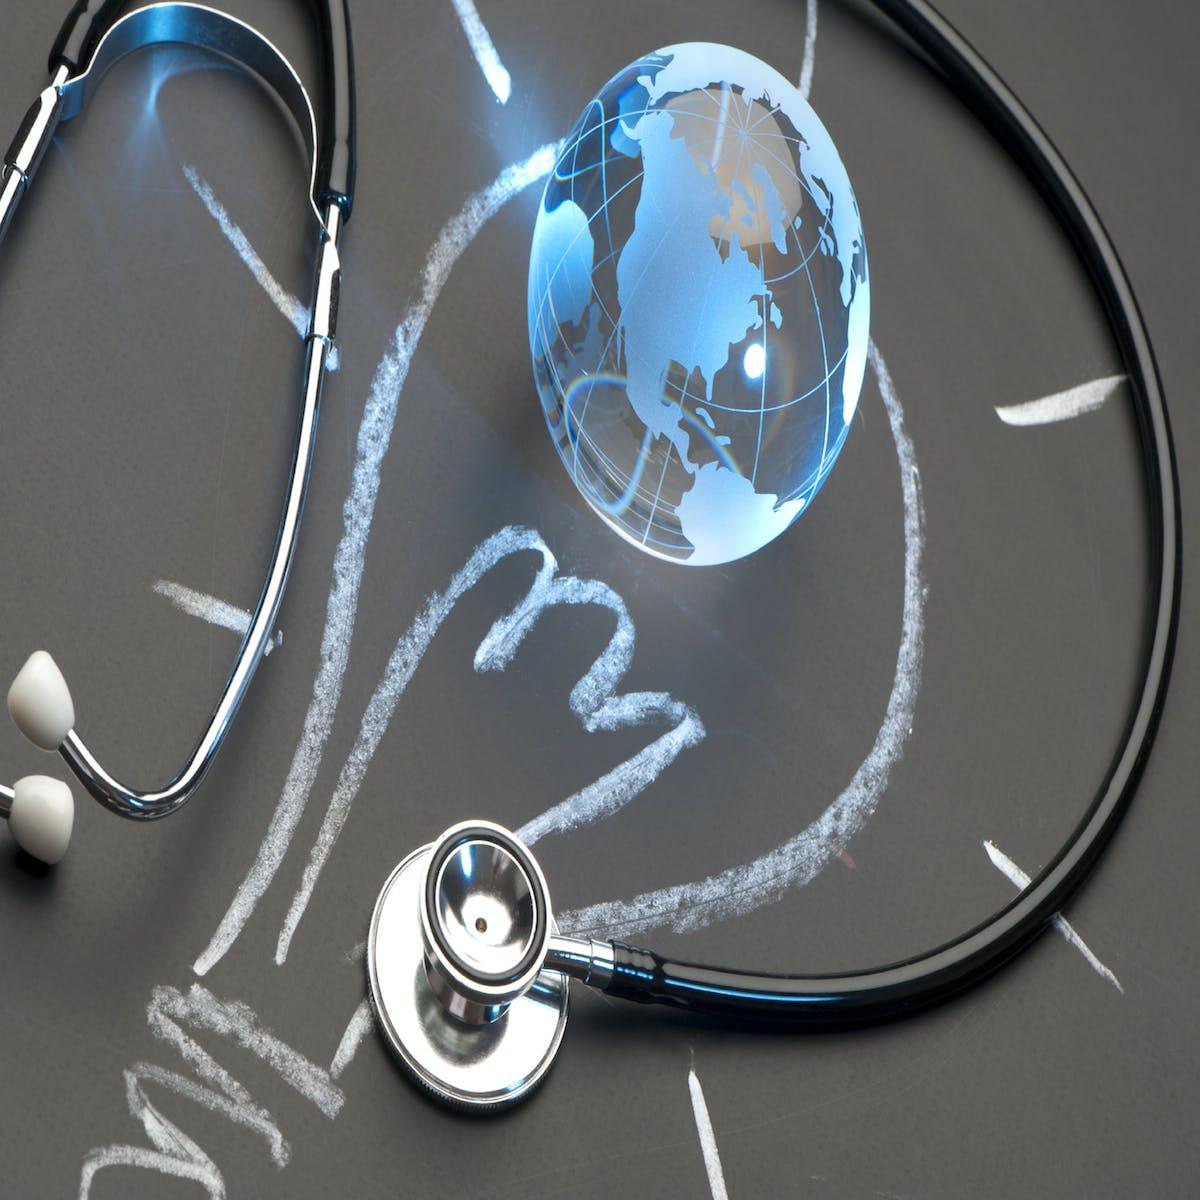 Healthcare Innovation and Entrepreneurship